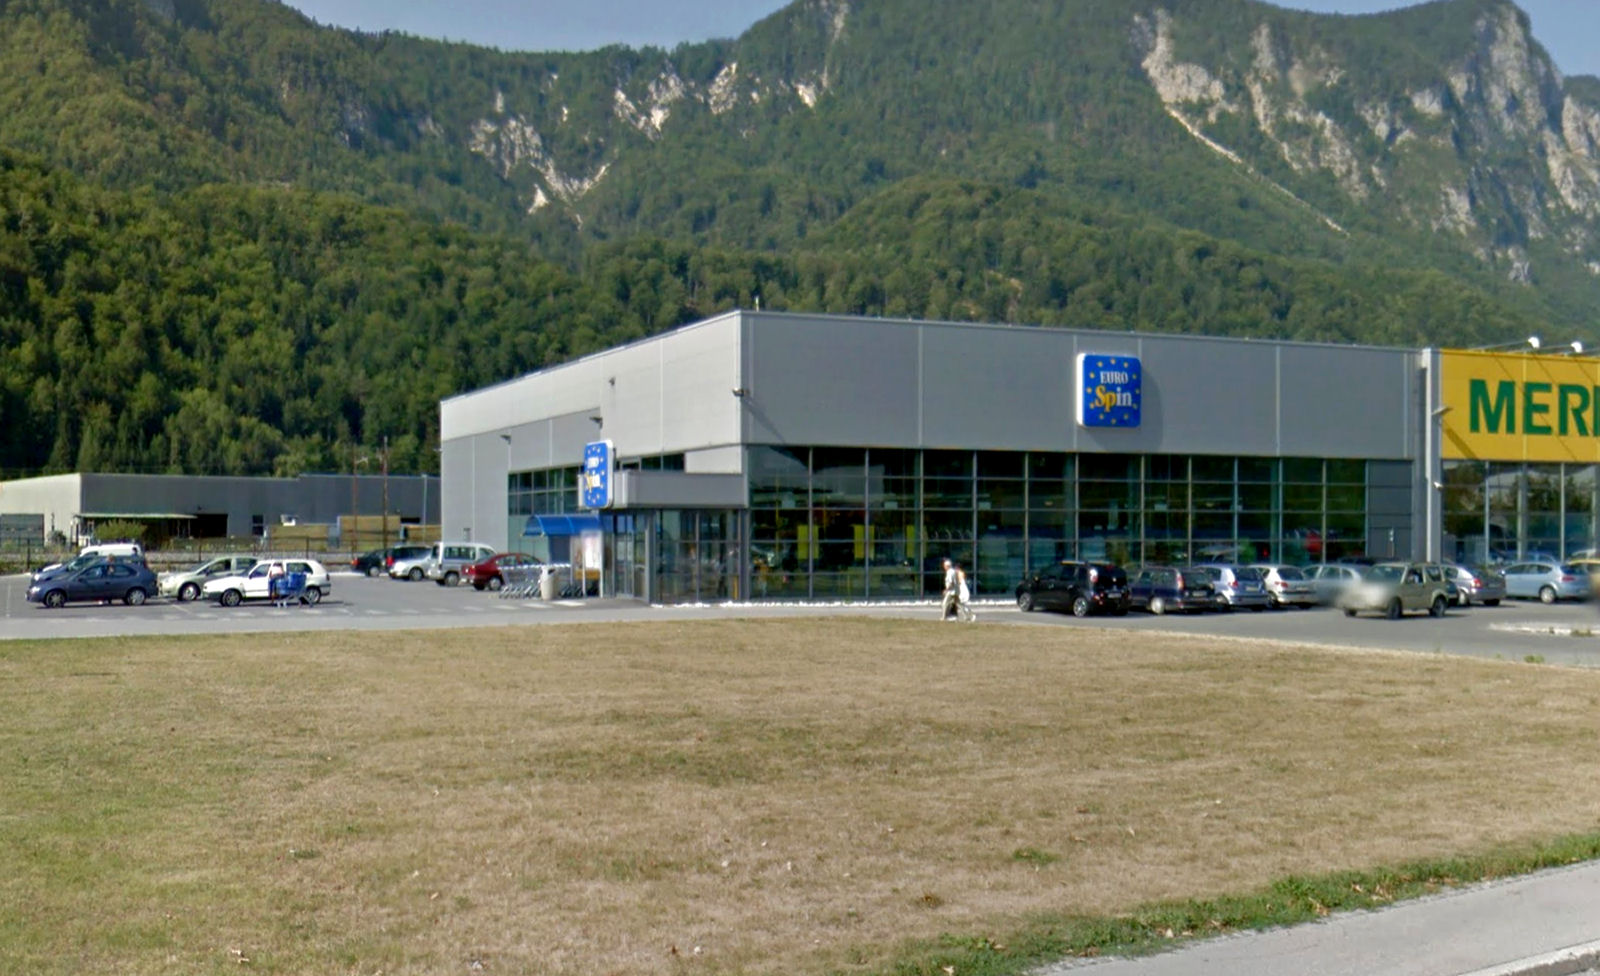 Eurospin  supermarket in Jesenice, Slovenia